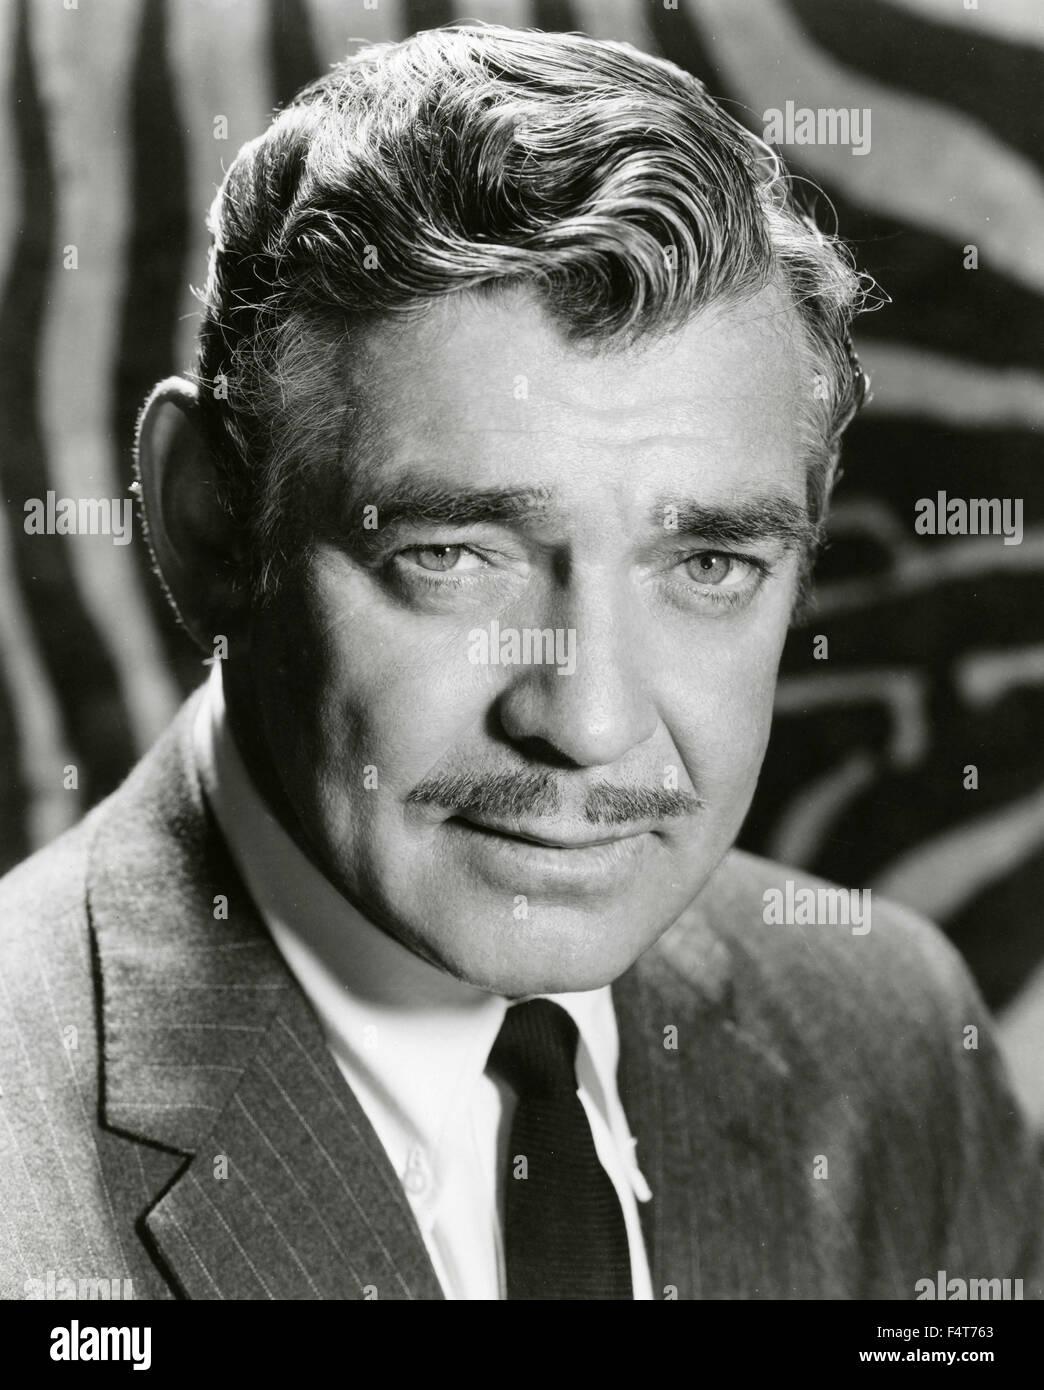 American actor Clark Gable - Stock Image